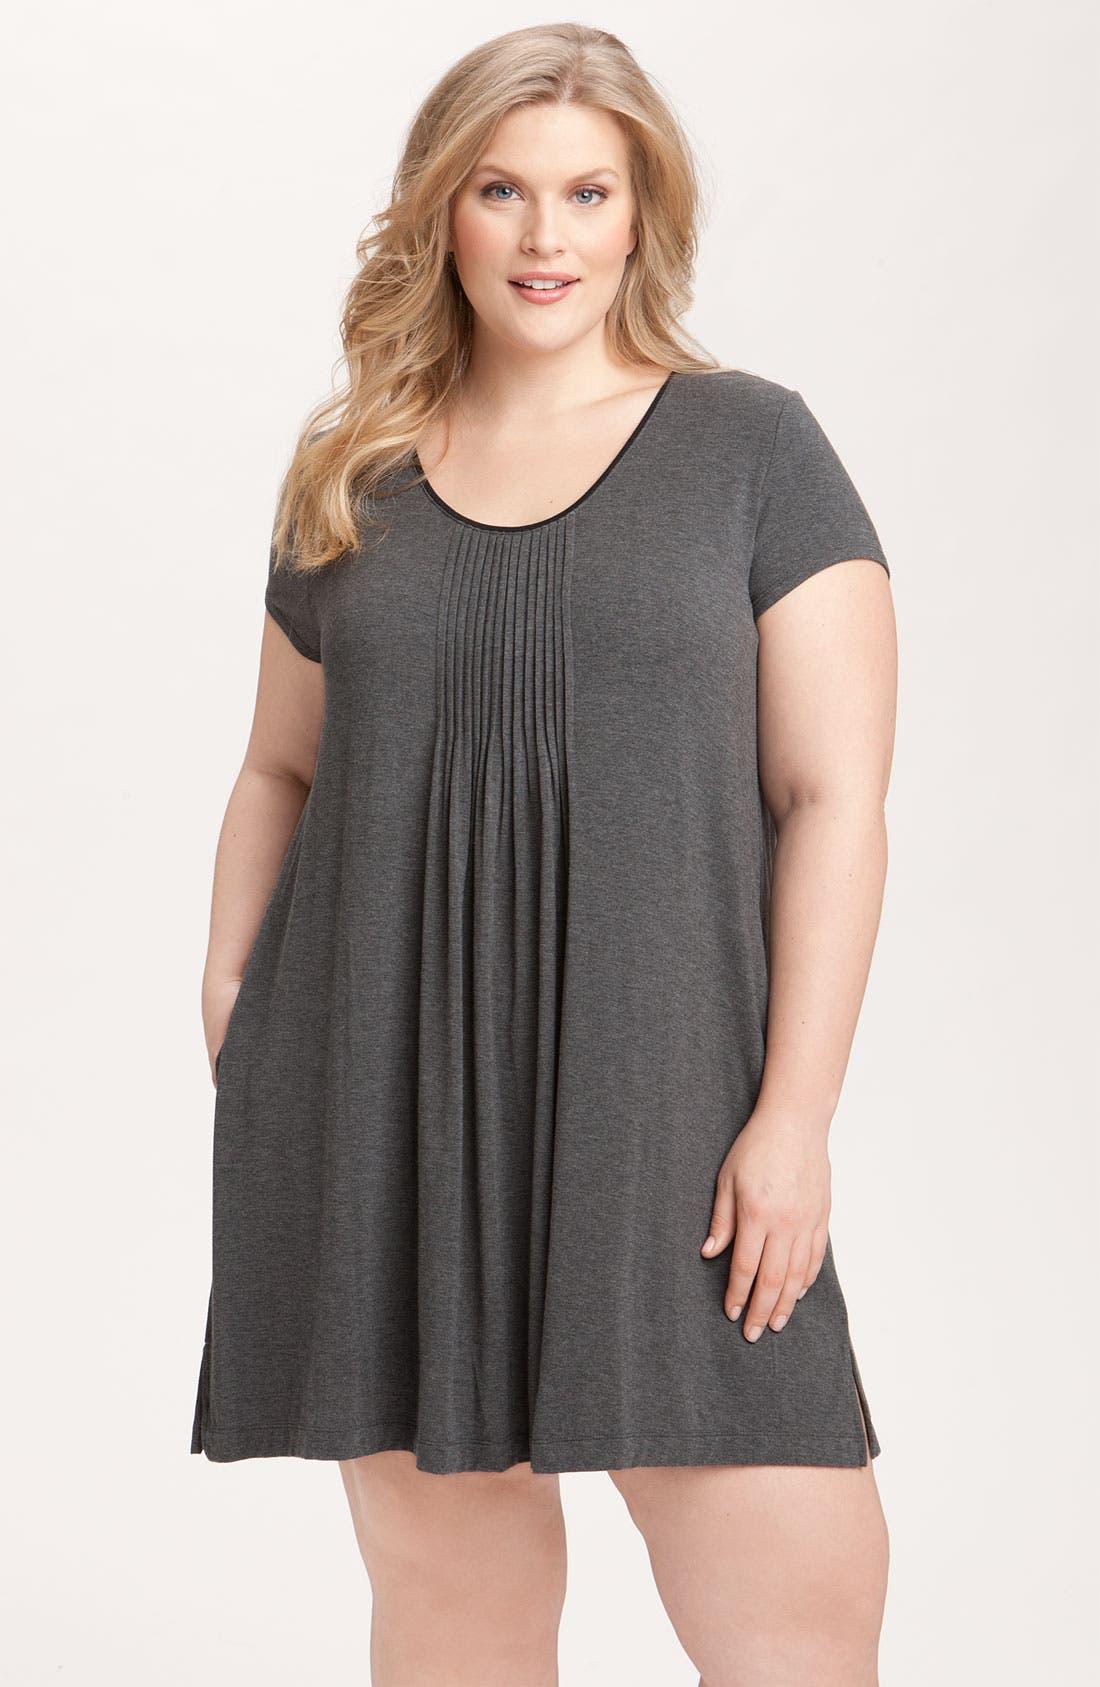 Main Image - DKNY '7 Easy Pieces' Pintuck Sleep Shirt (Plus Size)